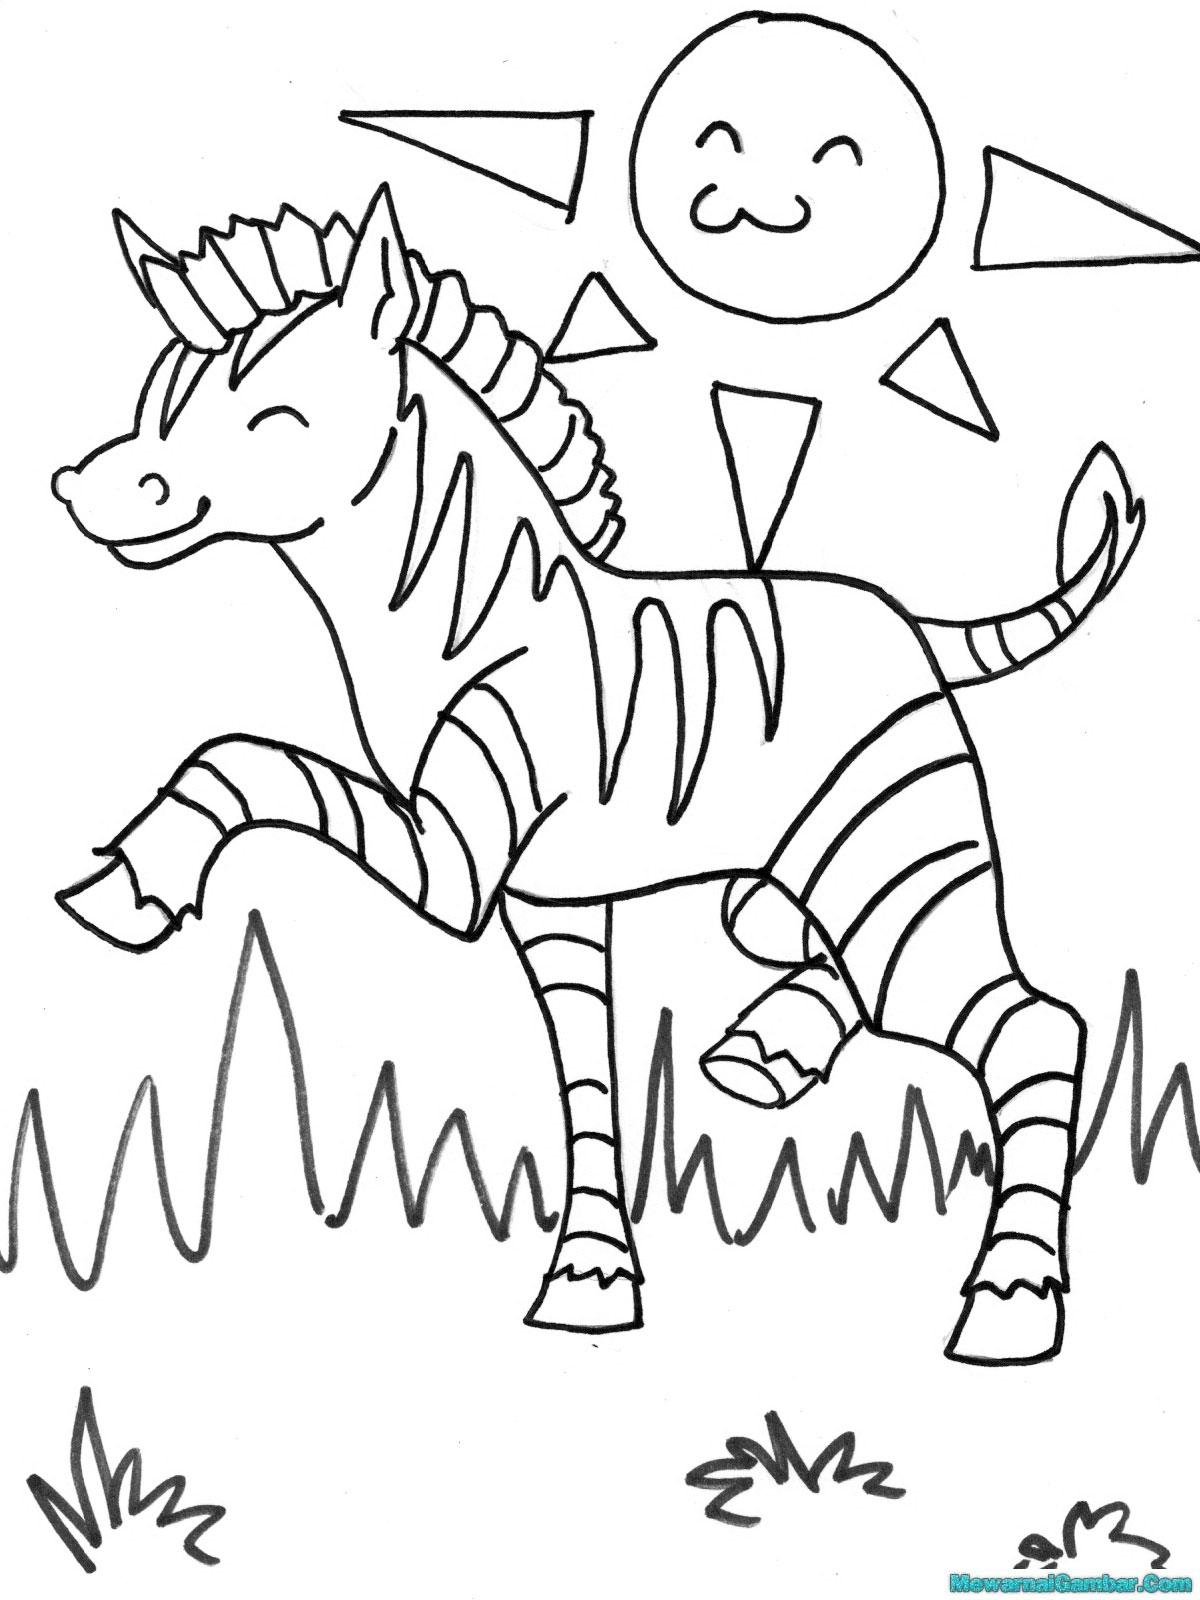 Buku Mewarnai 20 Gambar Zebra